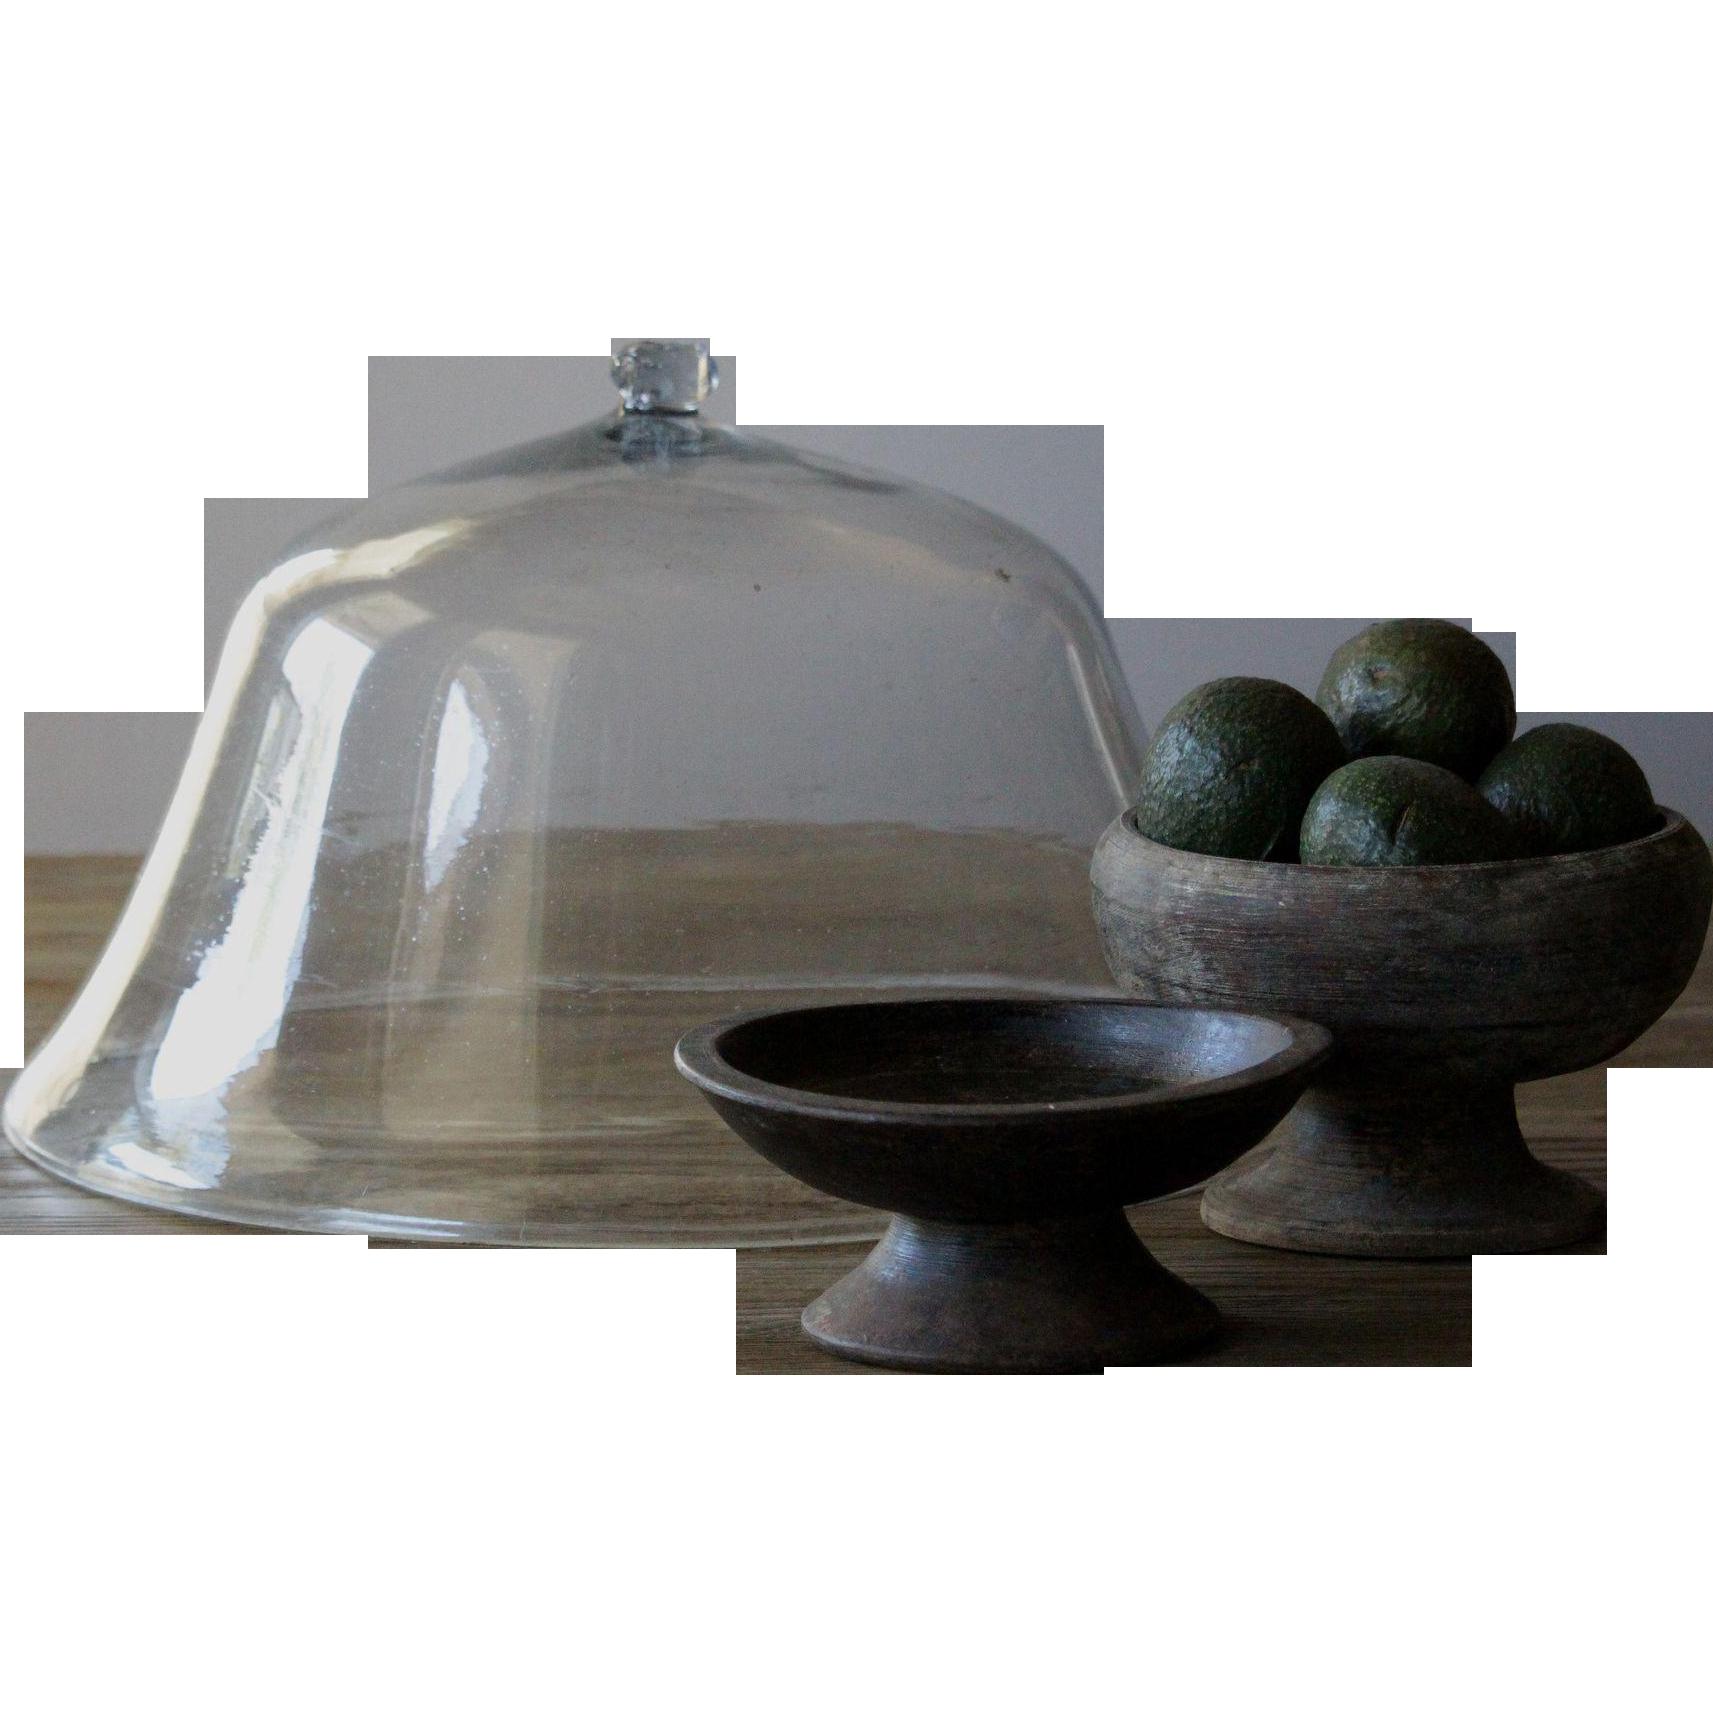 19th Century English Garden Melon Cloche - Antique Bell Glass